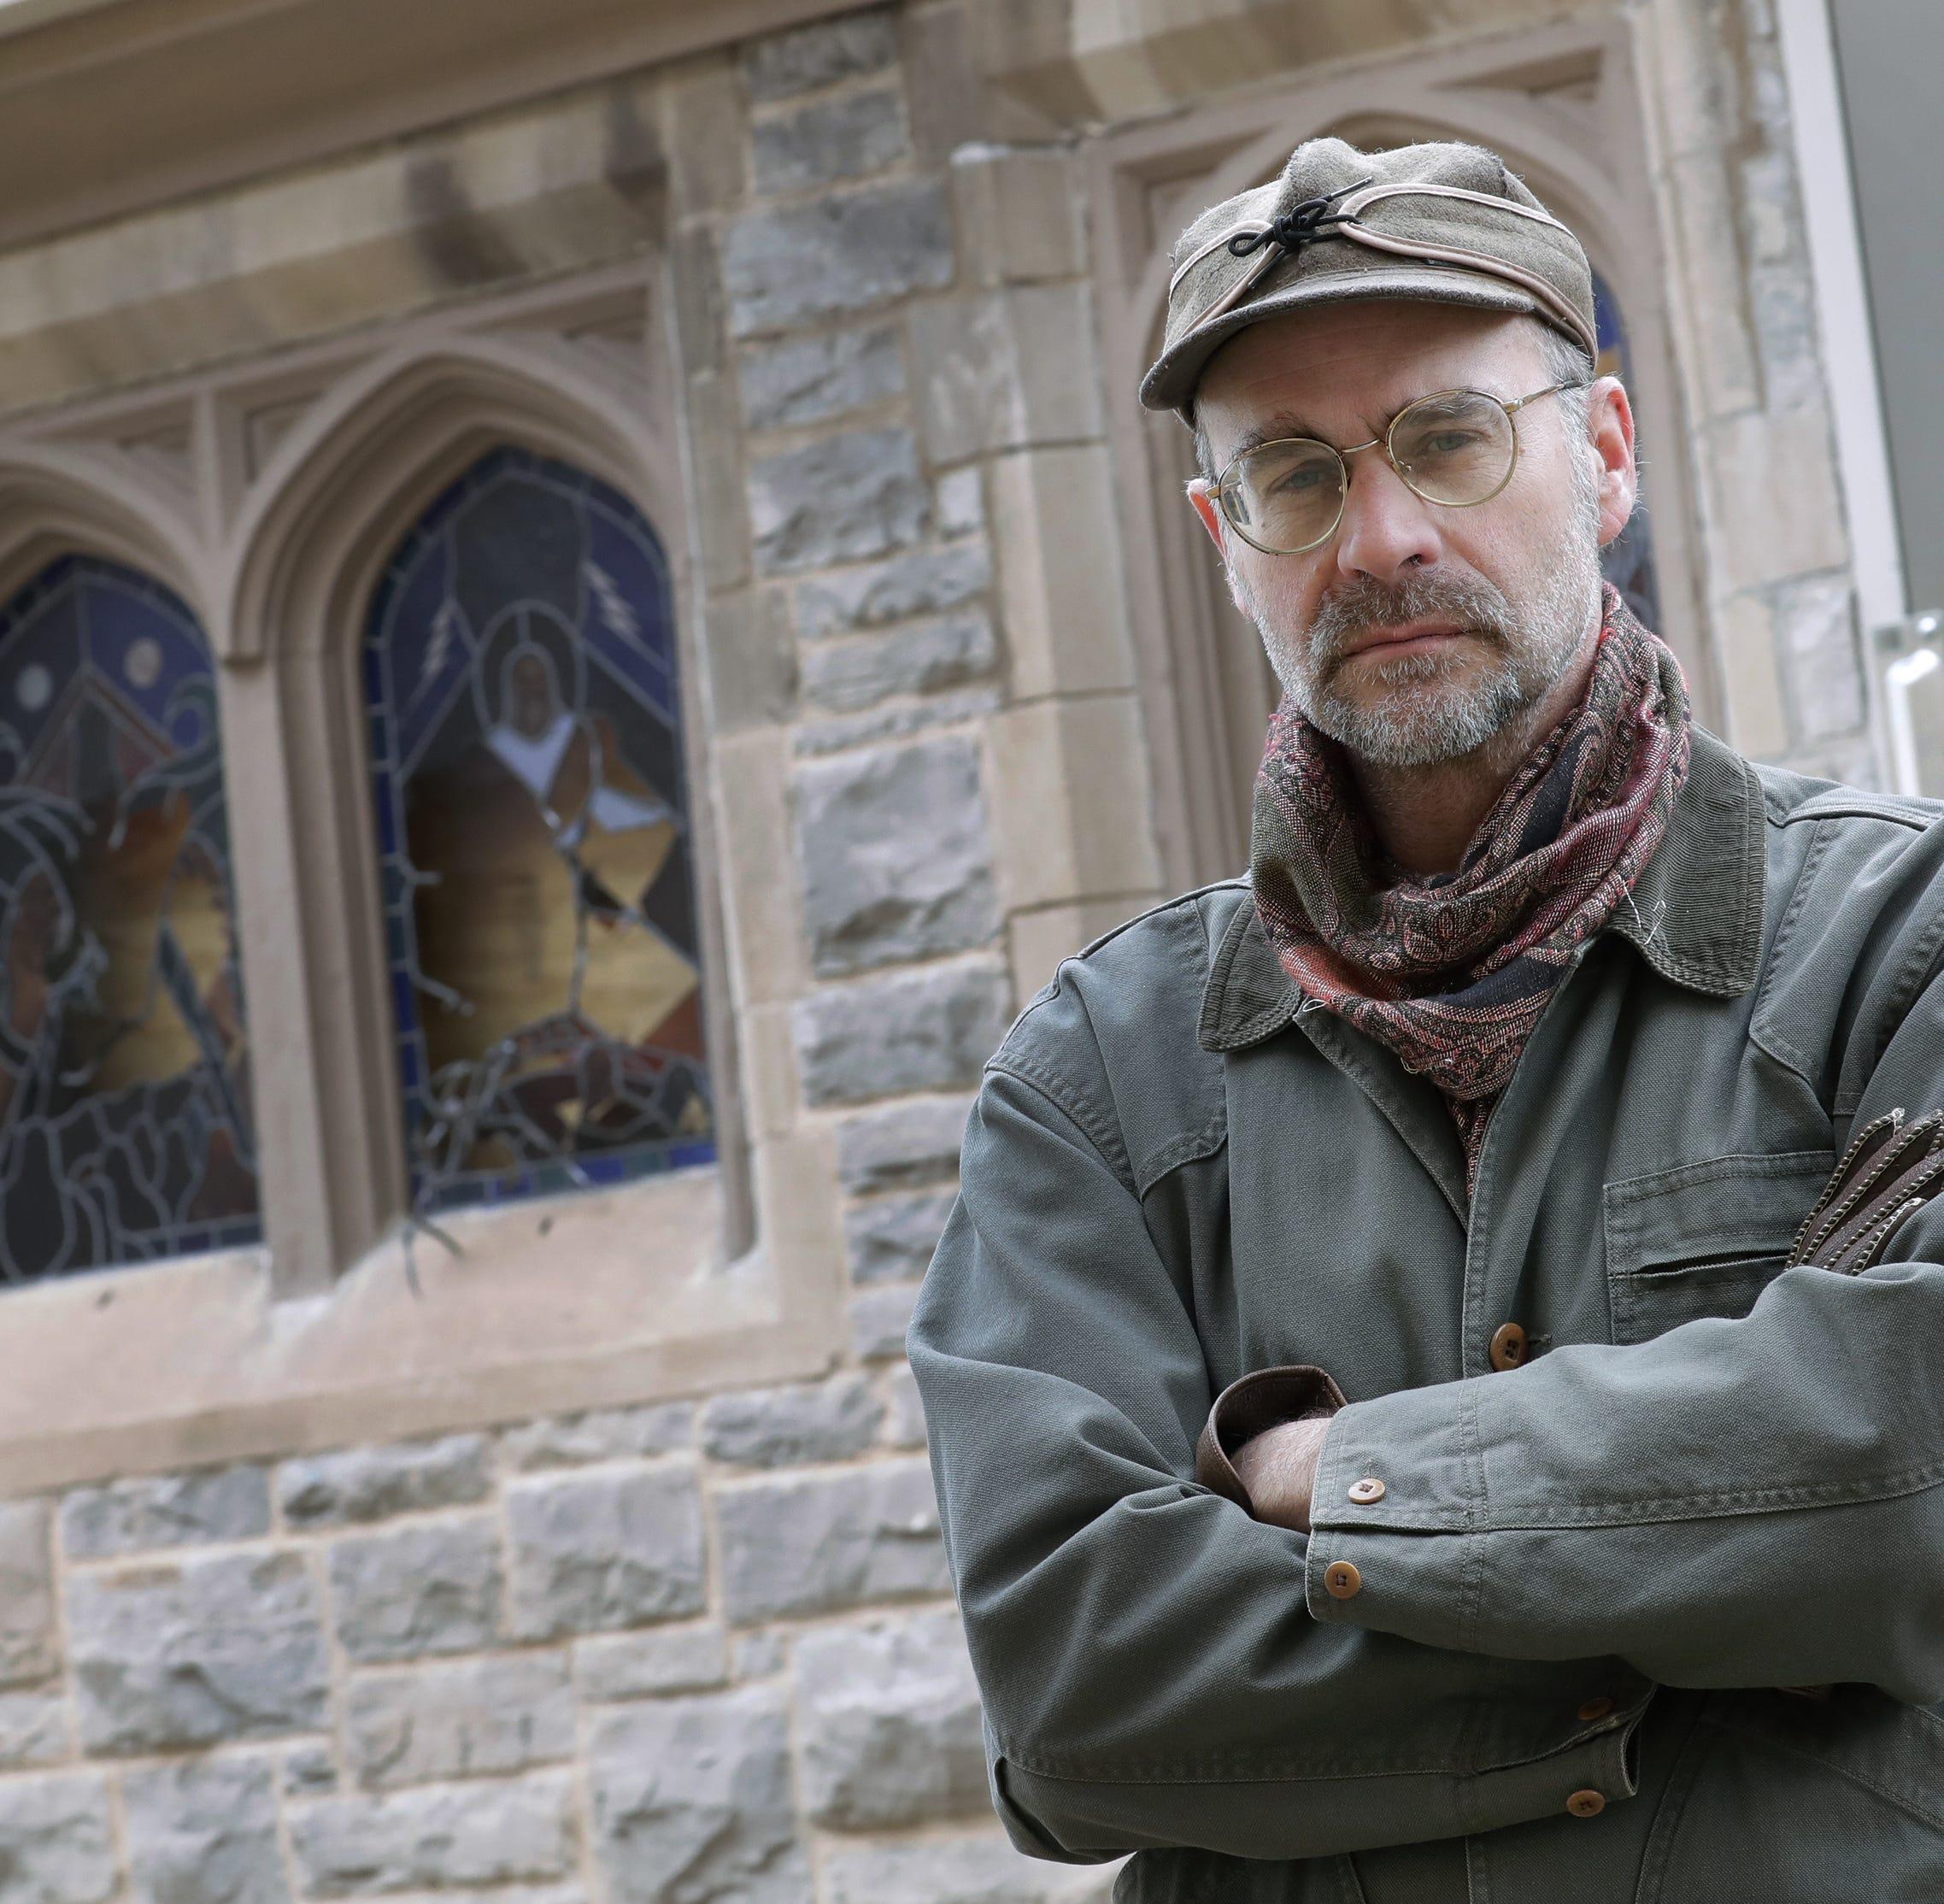 All Saints Episcopal Church staff heartbroken by vandalism attack